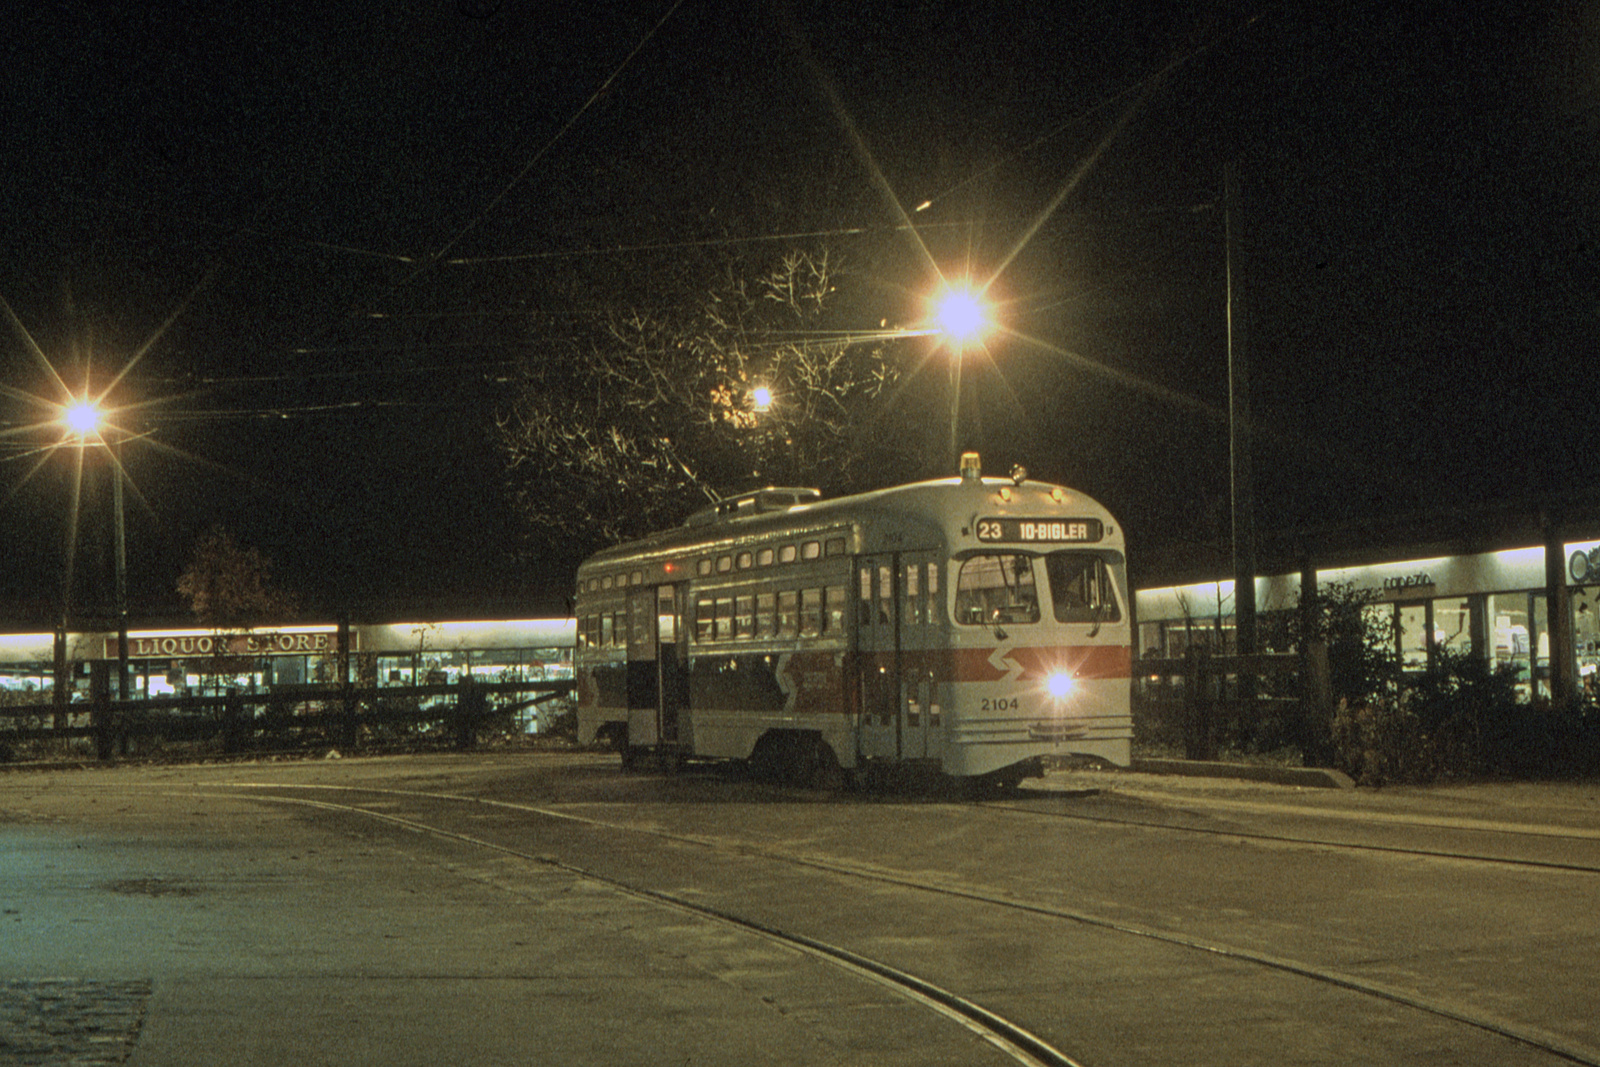 (901k, 1600x1067)<br><b>Country:</b> United States<br><b>City:</b> Philadelphia, PA<br><b>System:</b> SEPTA (or Predecessor)<br><b>Line:</b> Rt. 23-Germantown<br><b>Location:</b> Bethlehem Pike/Chestnut Hill Loop<br><b>Car:</b> PTC/SEPTA Postwar All-electric PCC (St.Louis, 1948) 2124 <br><b>Collection of:</b> David Pirmann<br><b>Viewed (this week/total):</b> 1 / 42